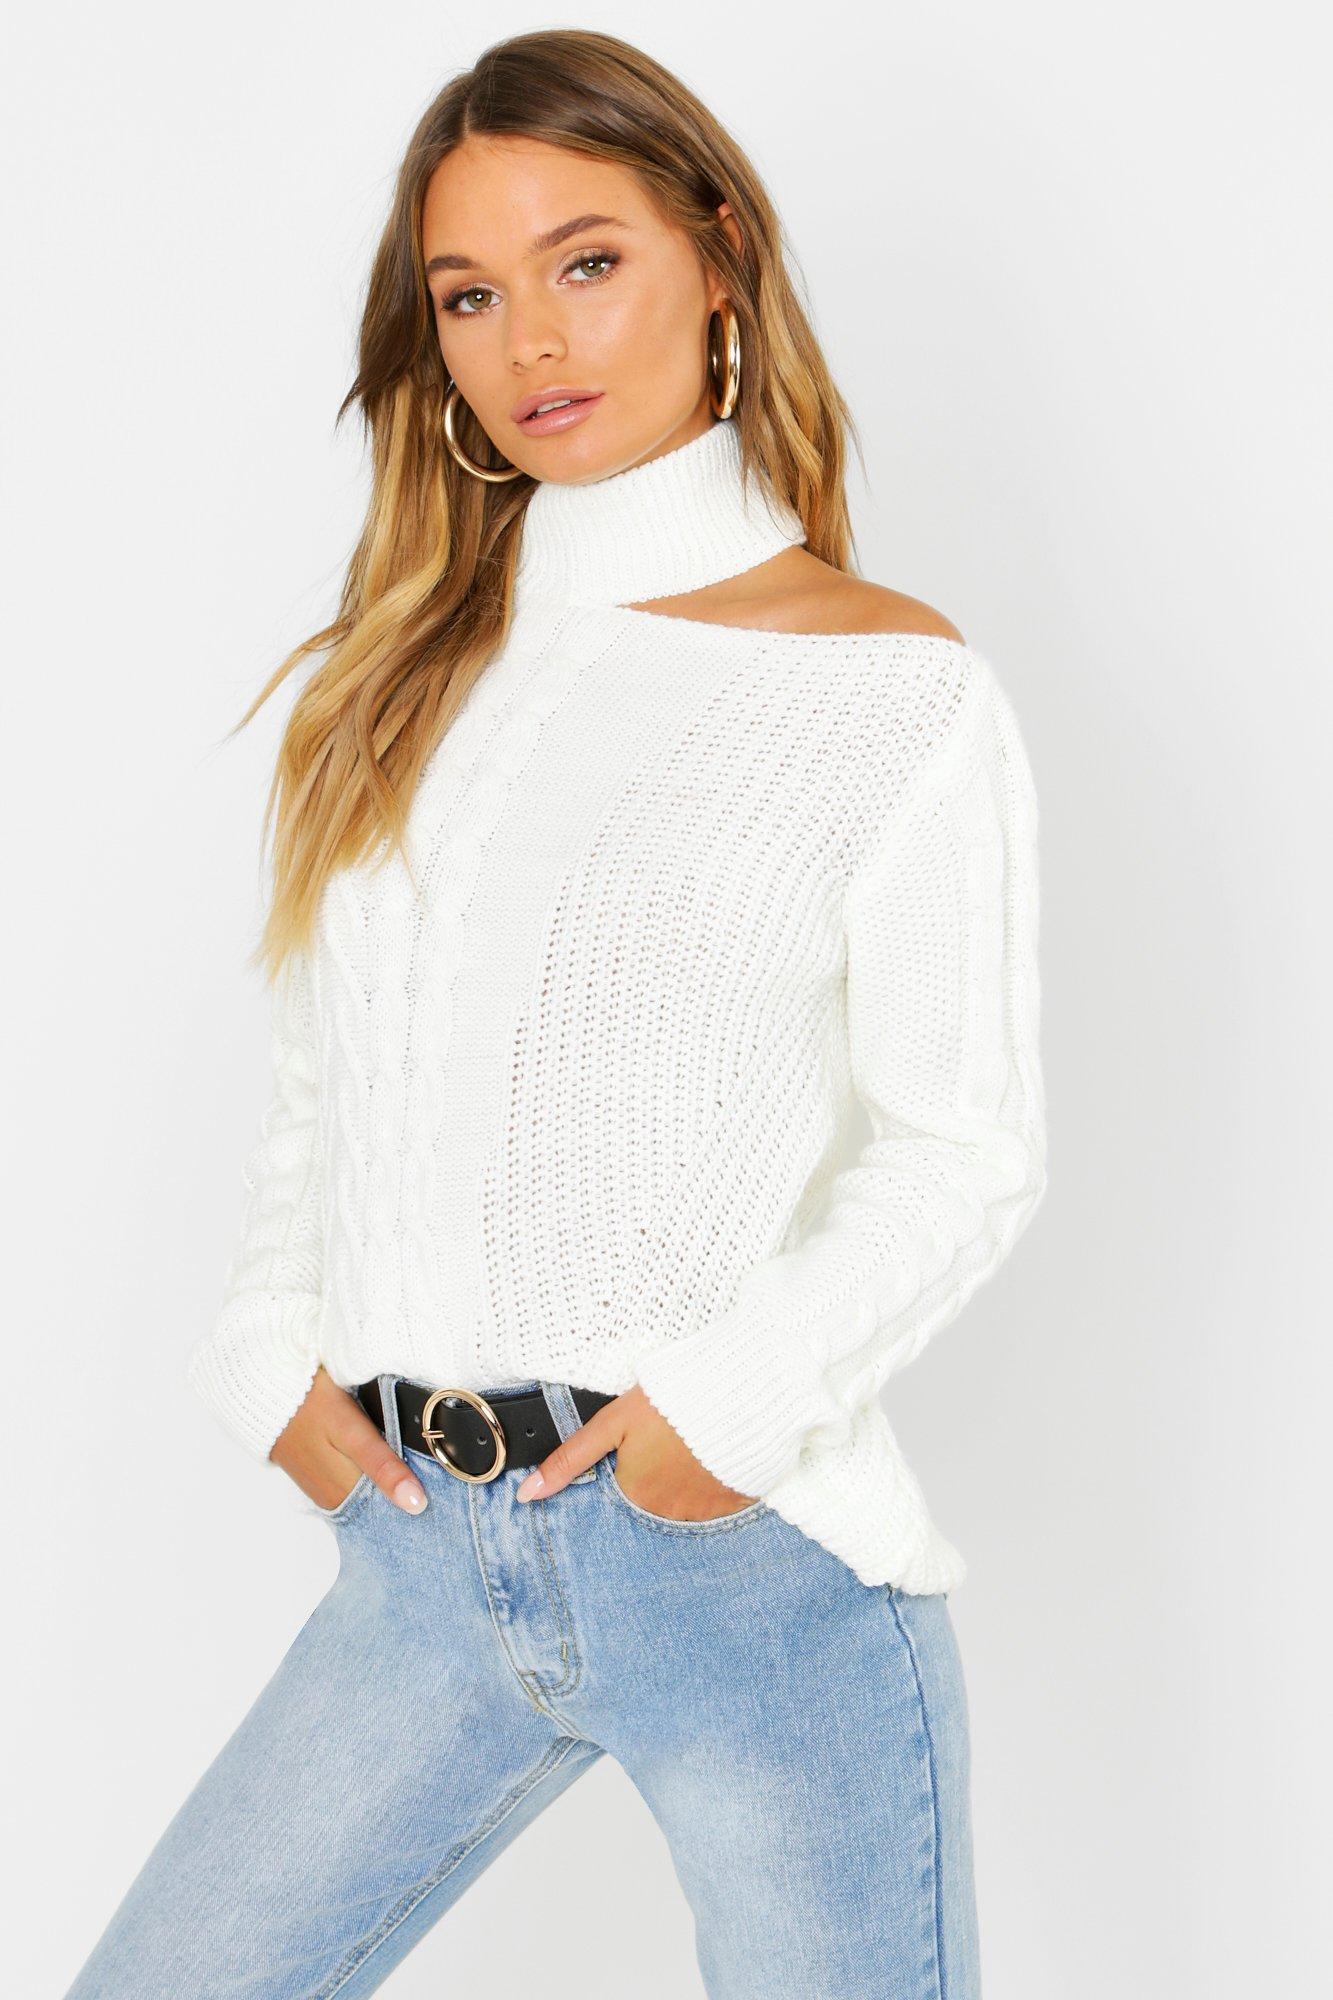 Womens Pullover mit Zopfmuster und Cutout an der Schulter - creme - S/M, Creme - Boohoo.com